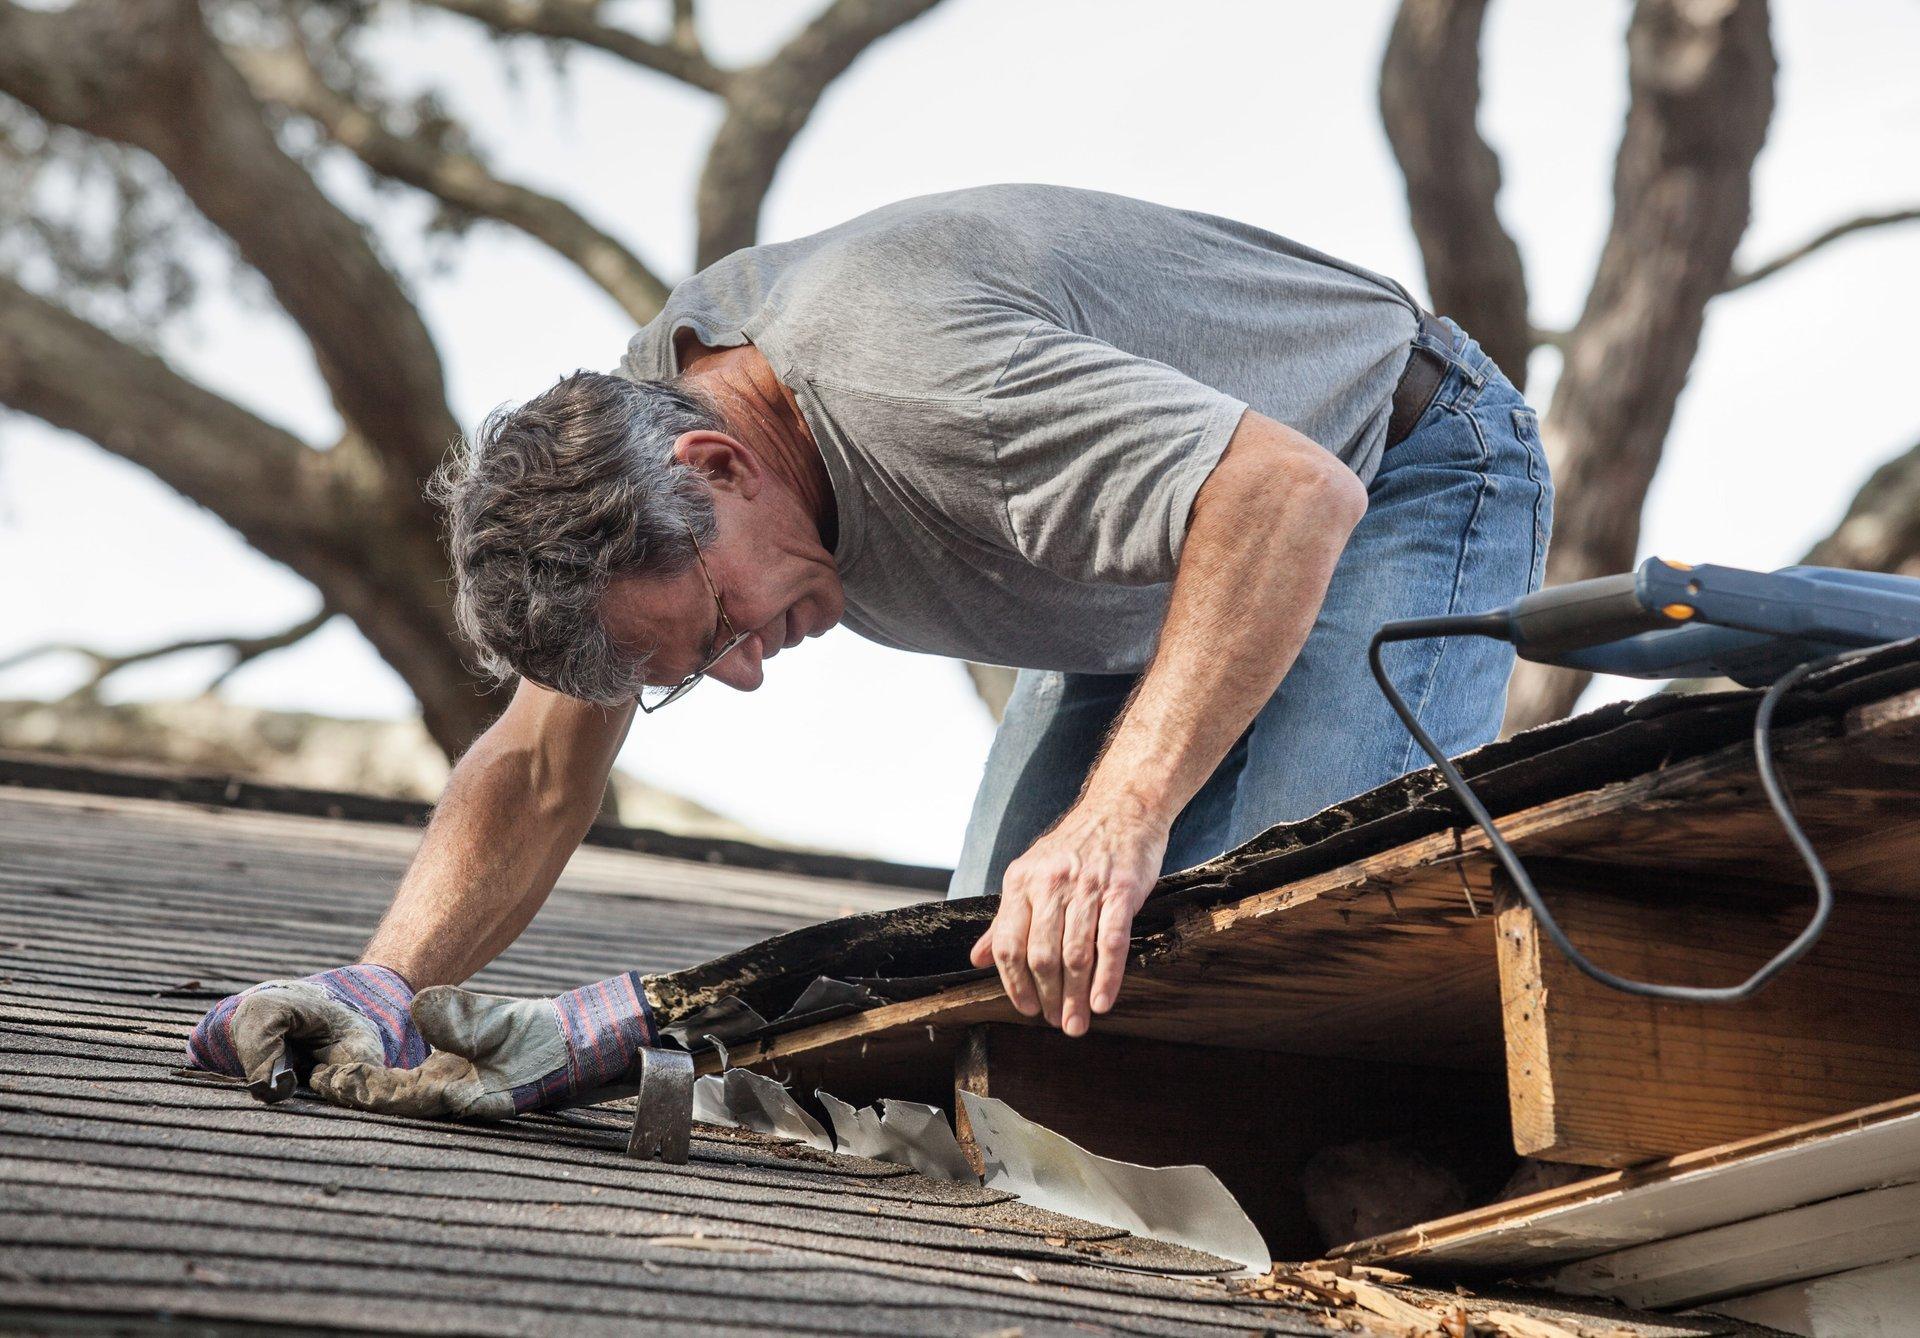 Roofing Amp Gutter Services Overland Park Ks Kansas City